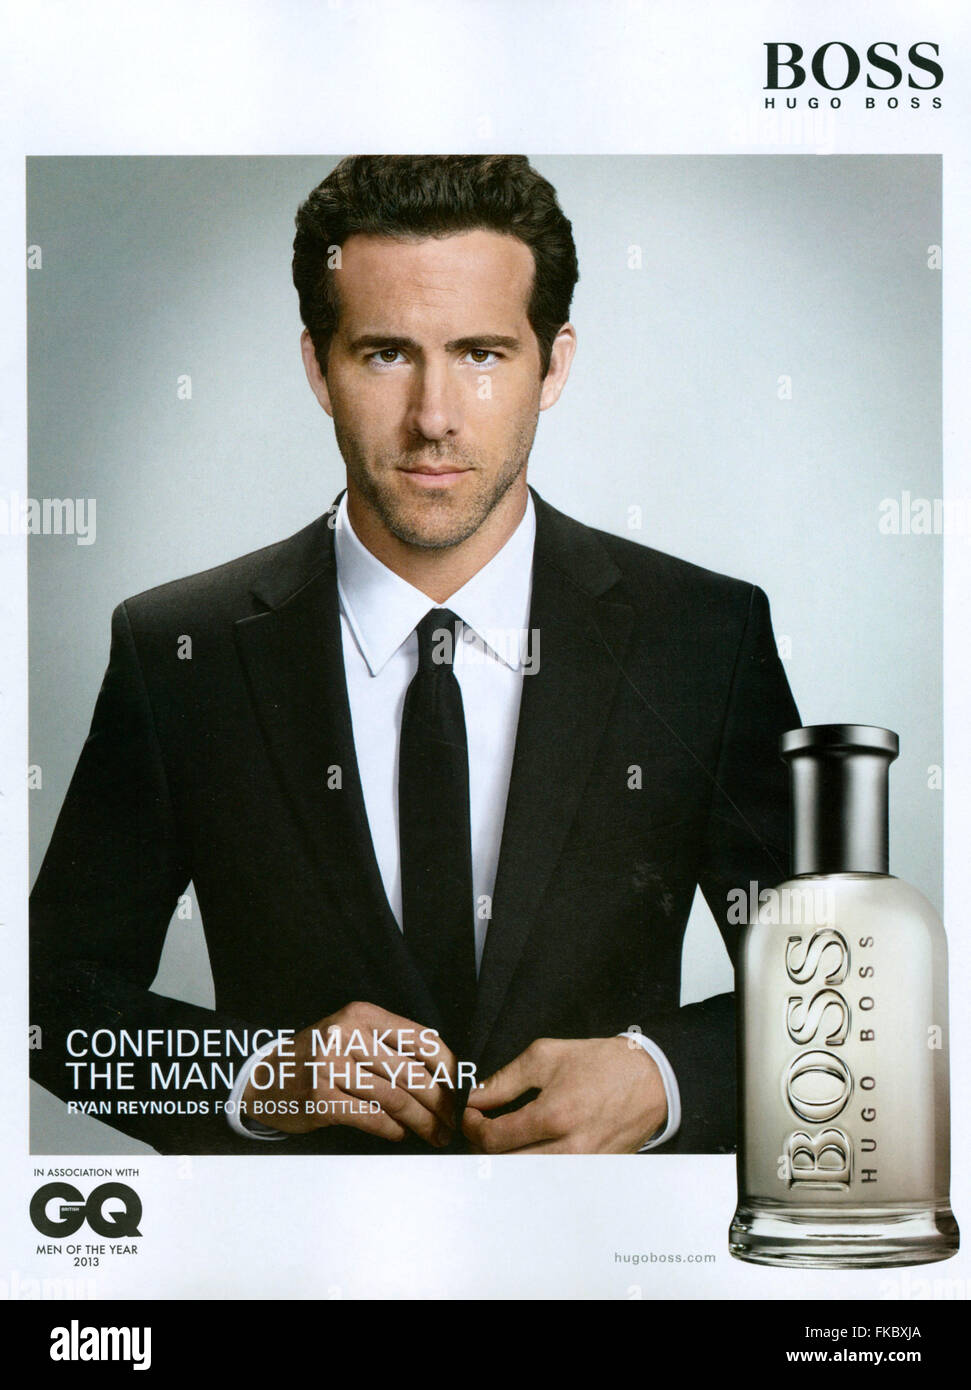 Boss Hugo men ad pictures